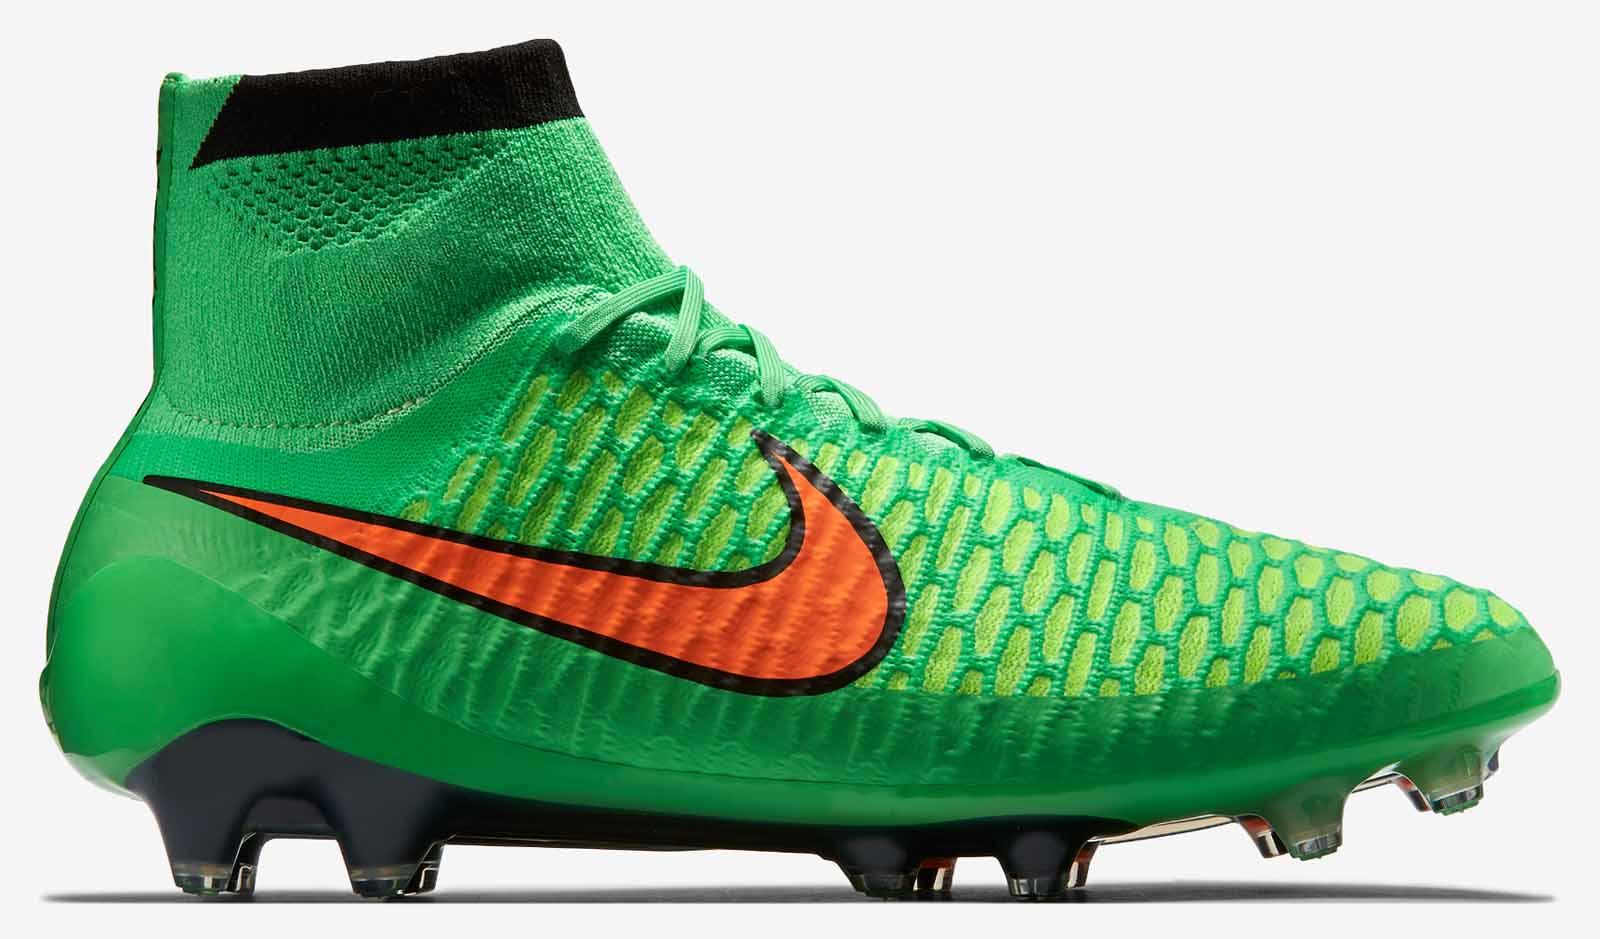 Nike Magista Soccer Cleats Green And Orange - Musée des ... 7135cab6beaf0